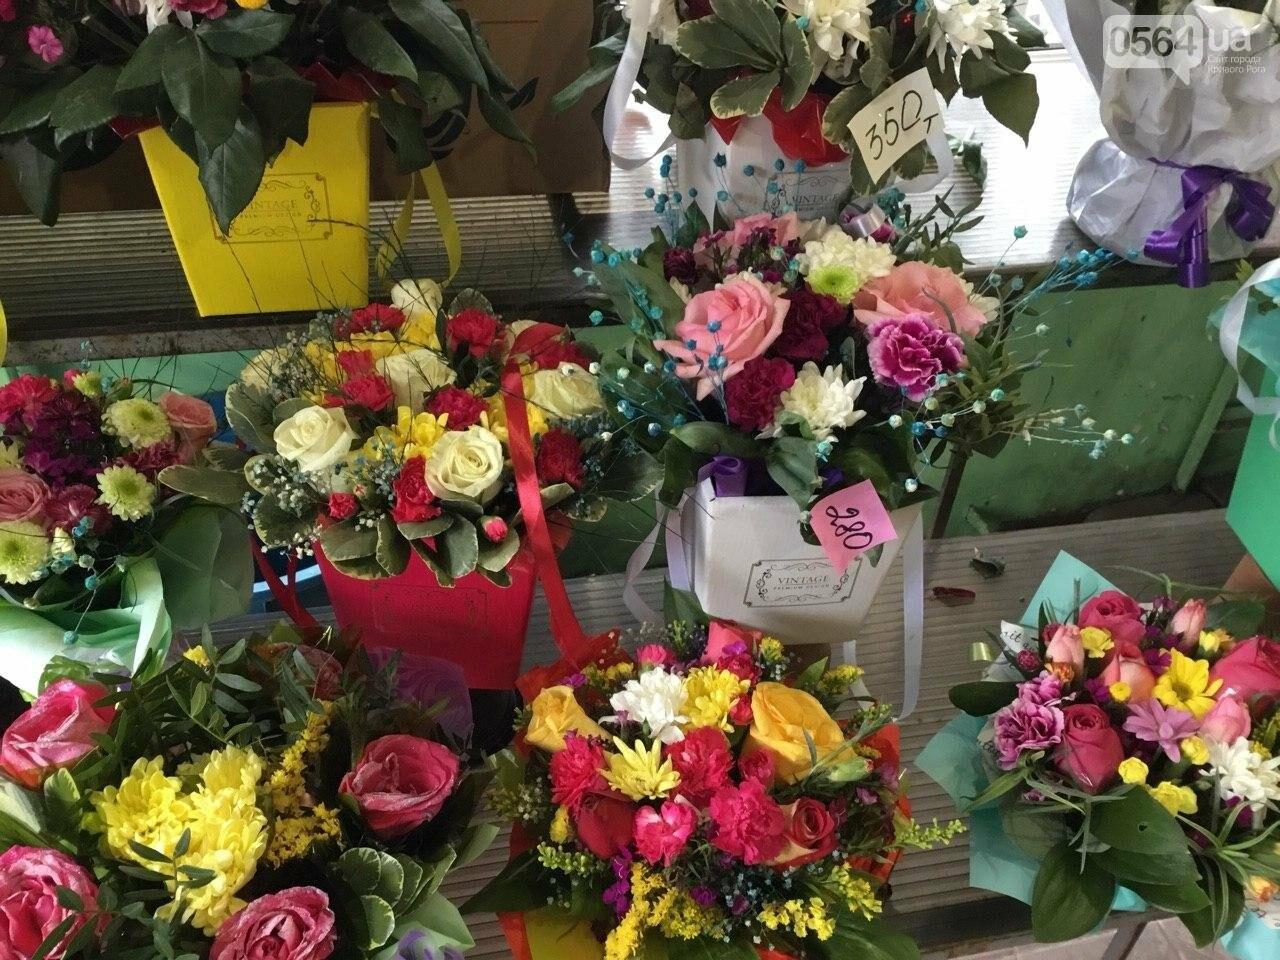 Сколько стоят примула, цикламен, мимоза? Обзор цен на цветы в Кривом Роге, - ФОТО, ВИДЕО, фото-22